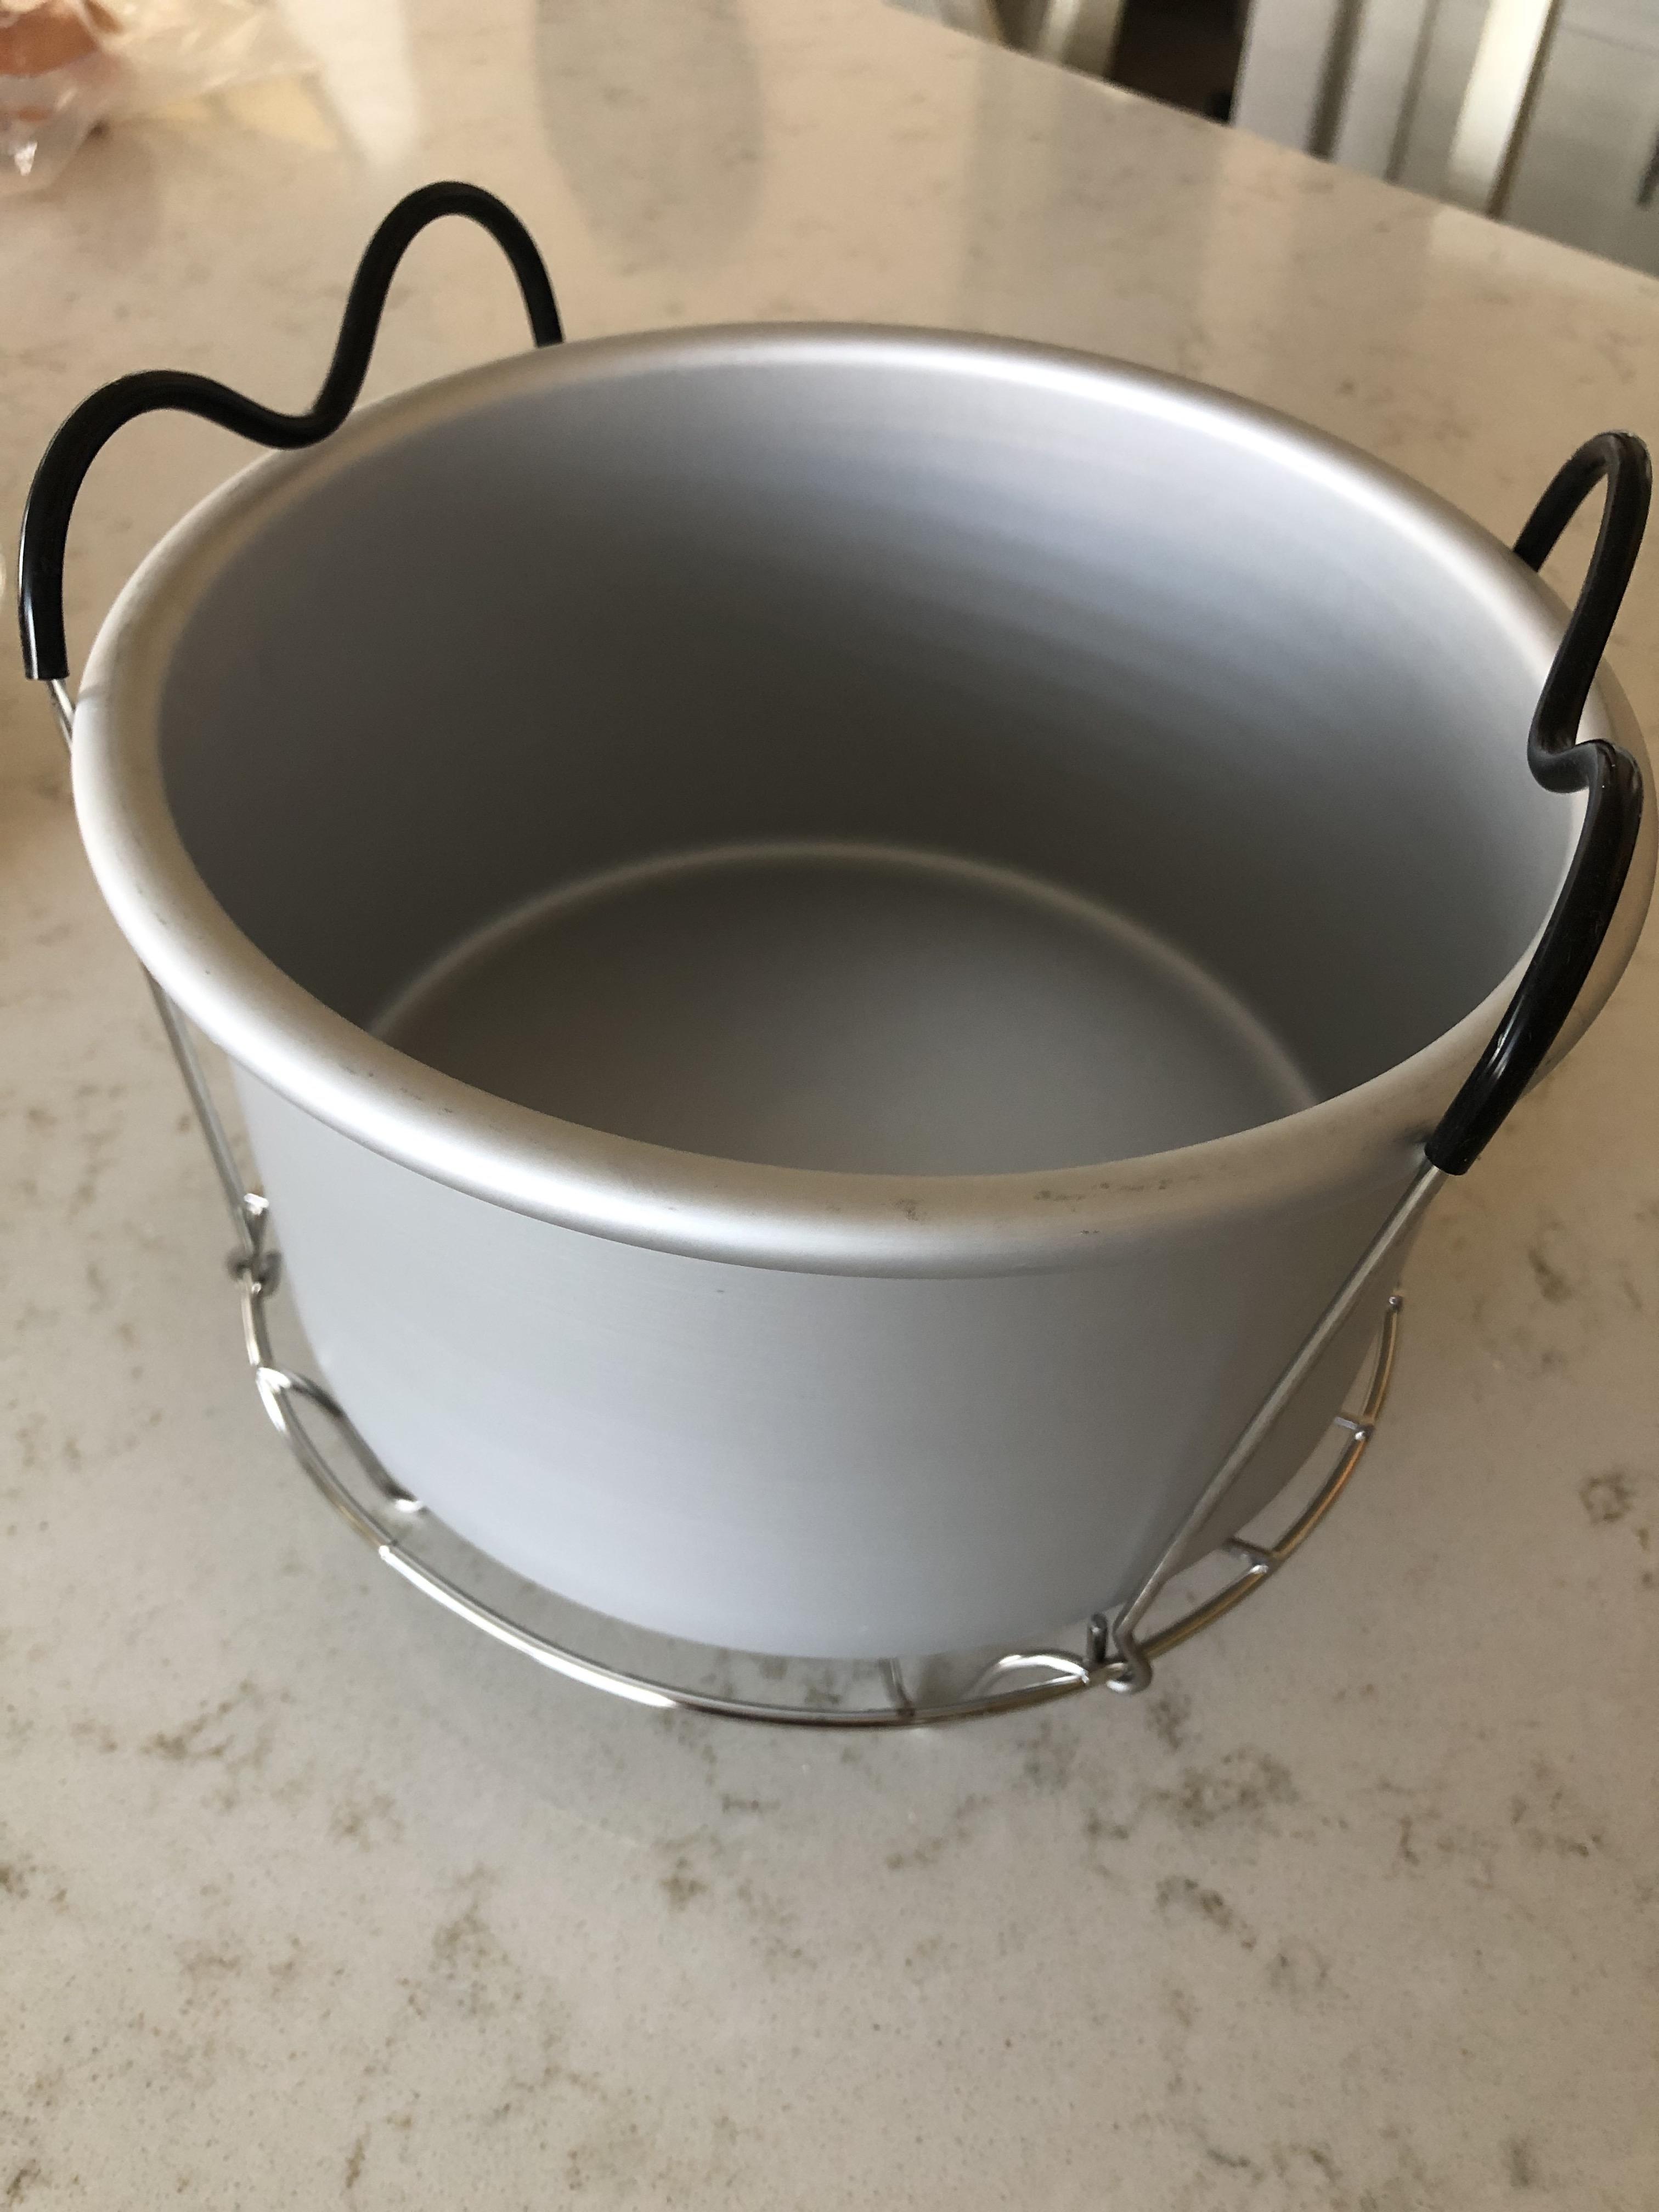 Instant pot on a trivet